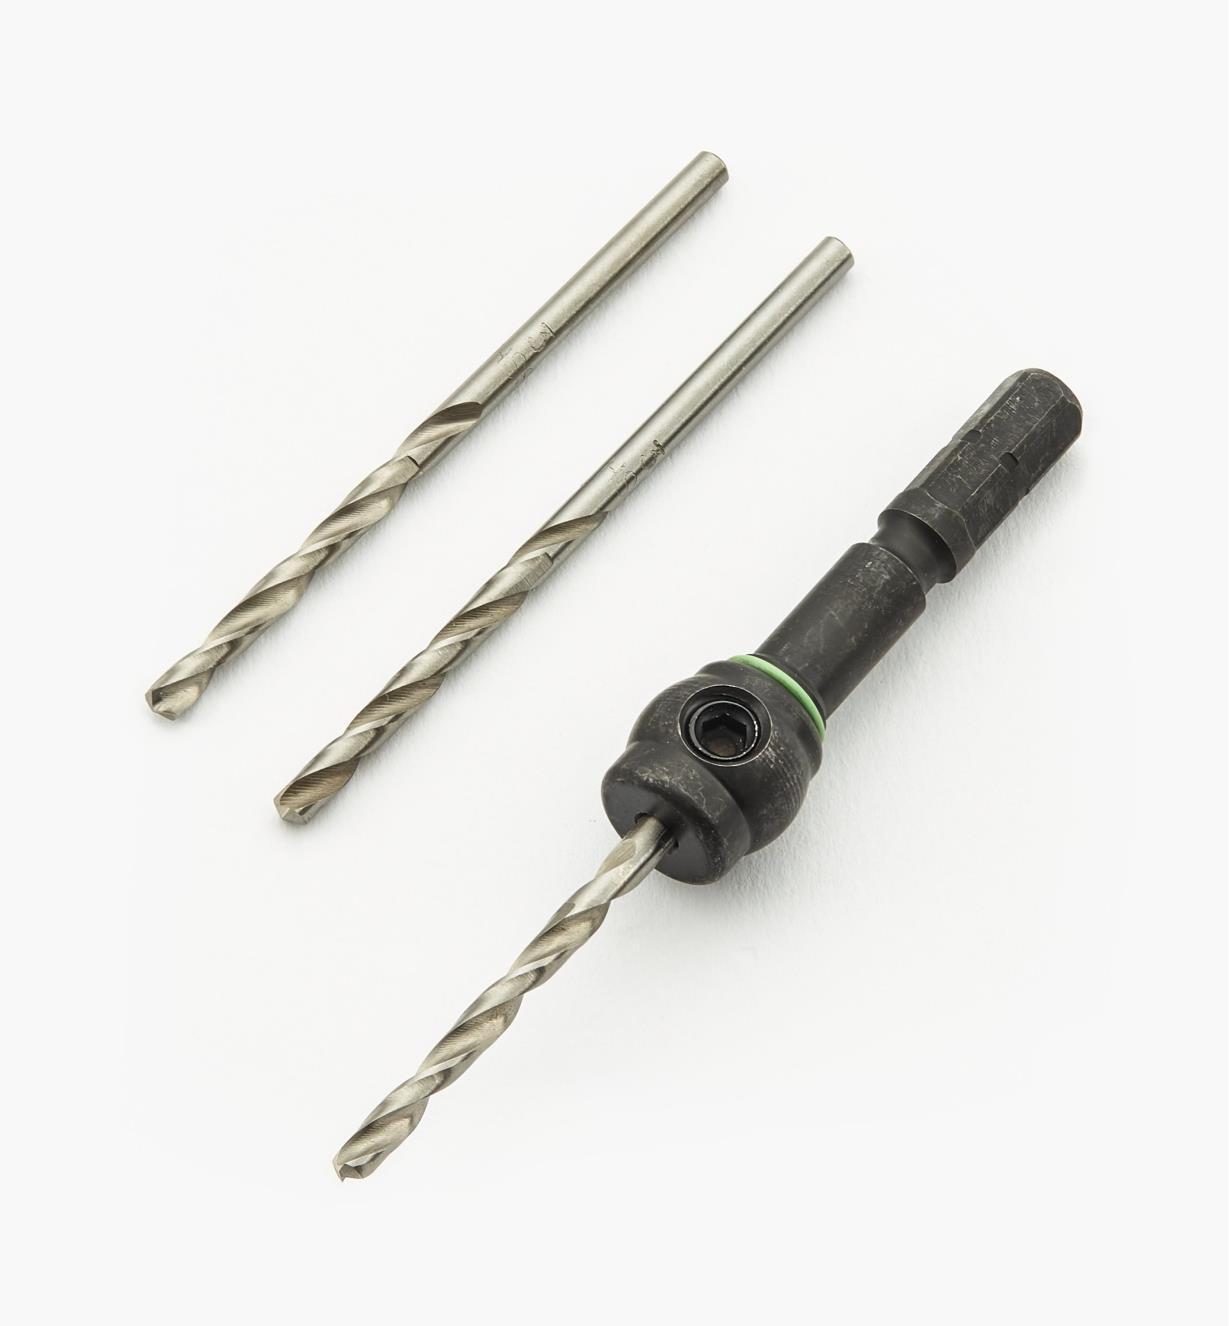 ZA493421 - Centrotec HSS Spiral Drill Bits - 3mm